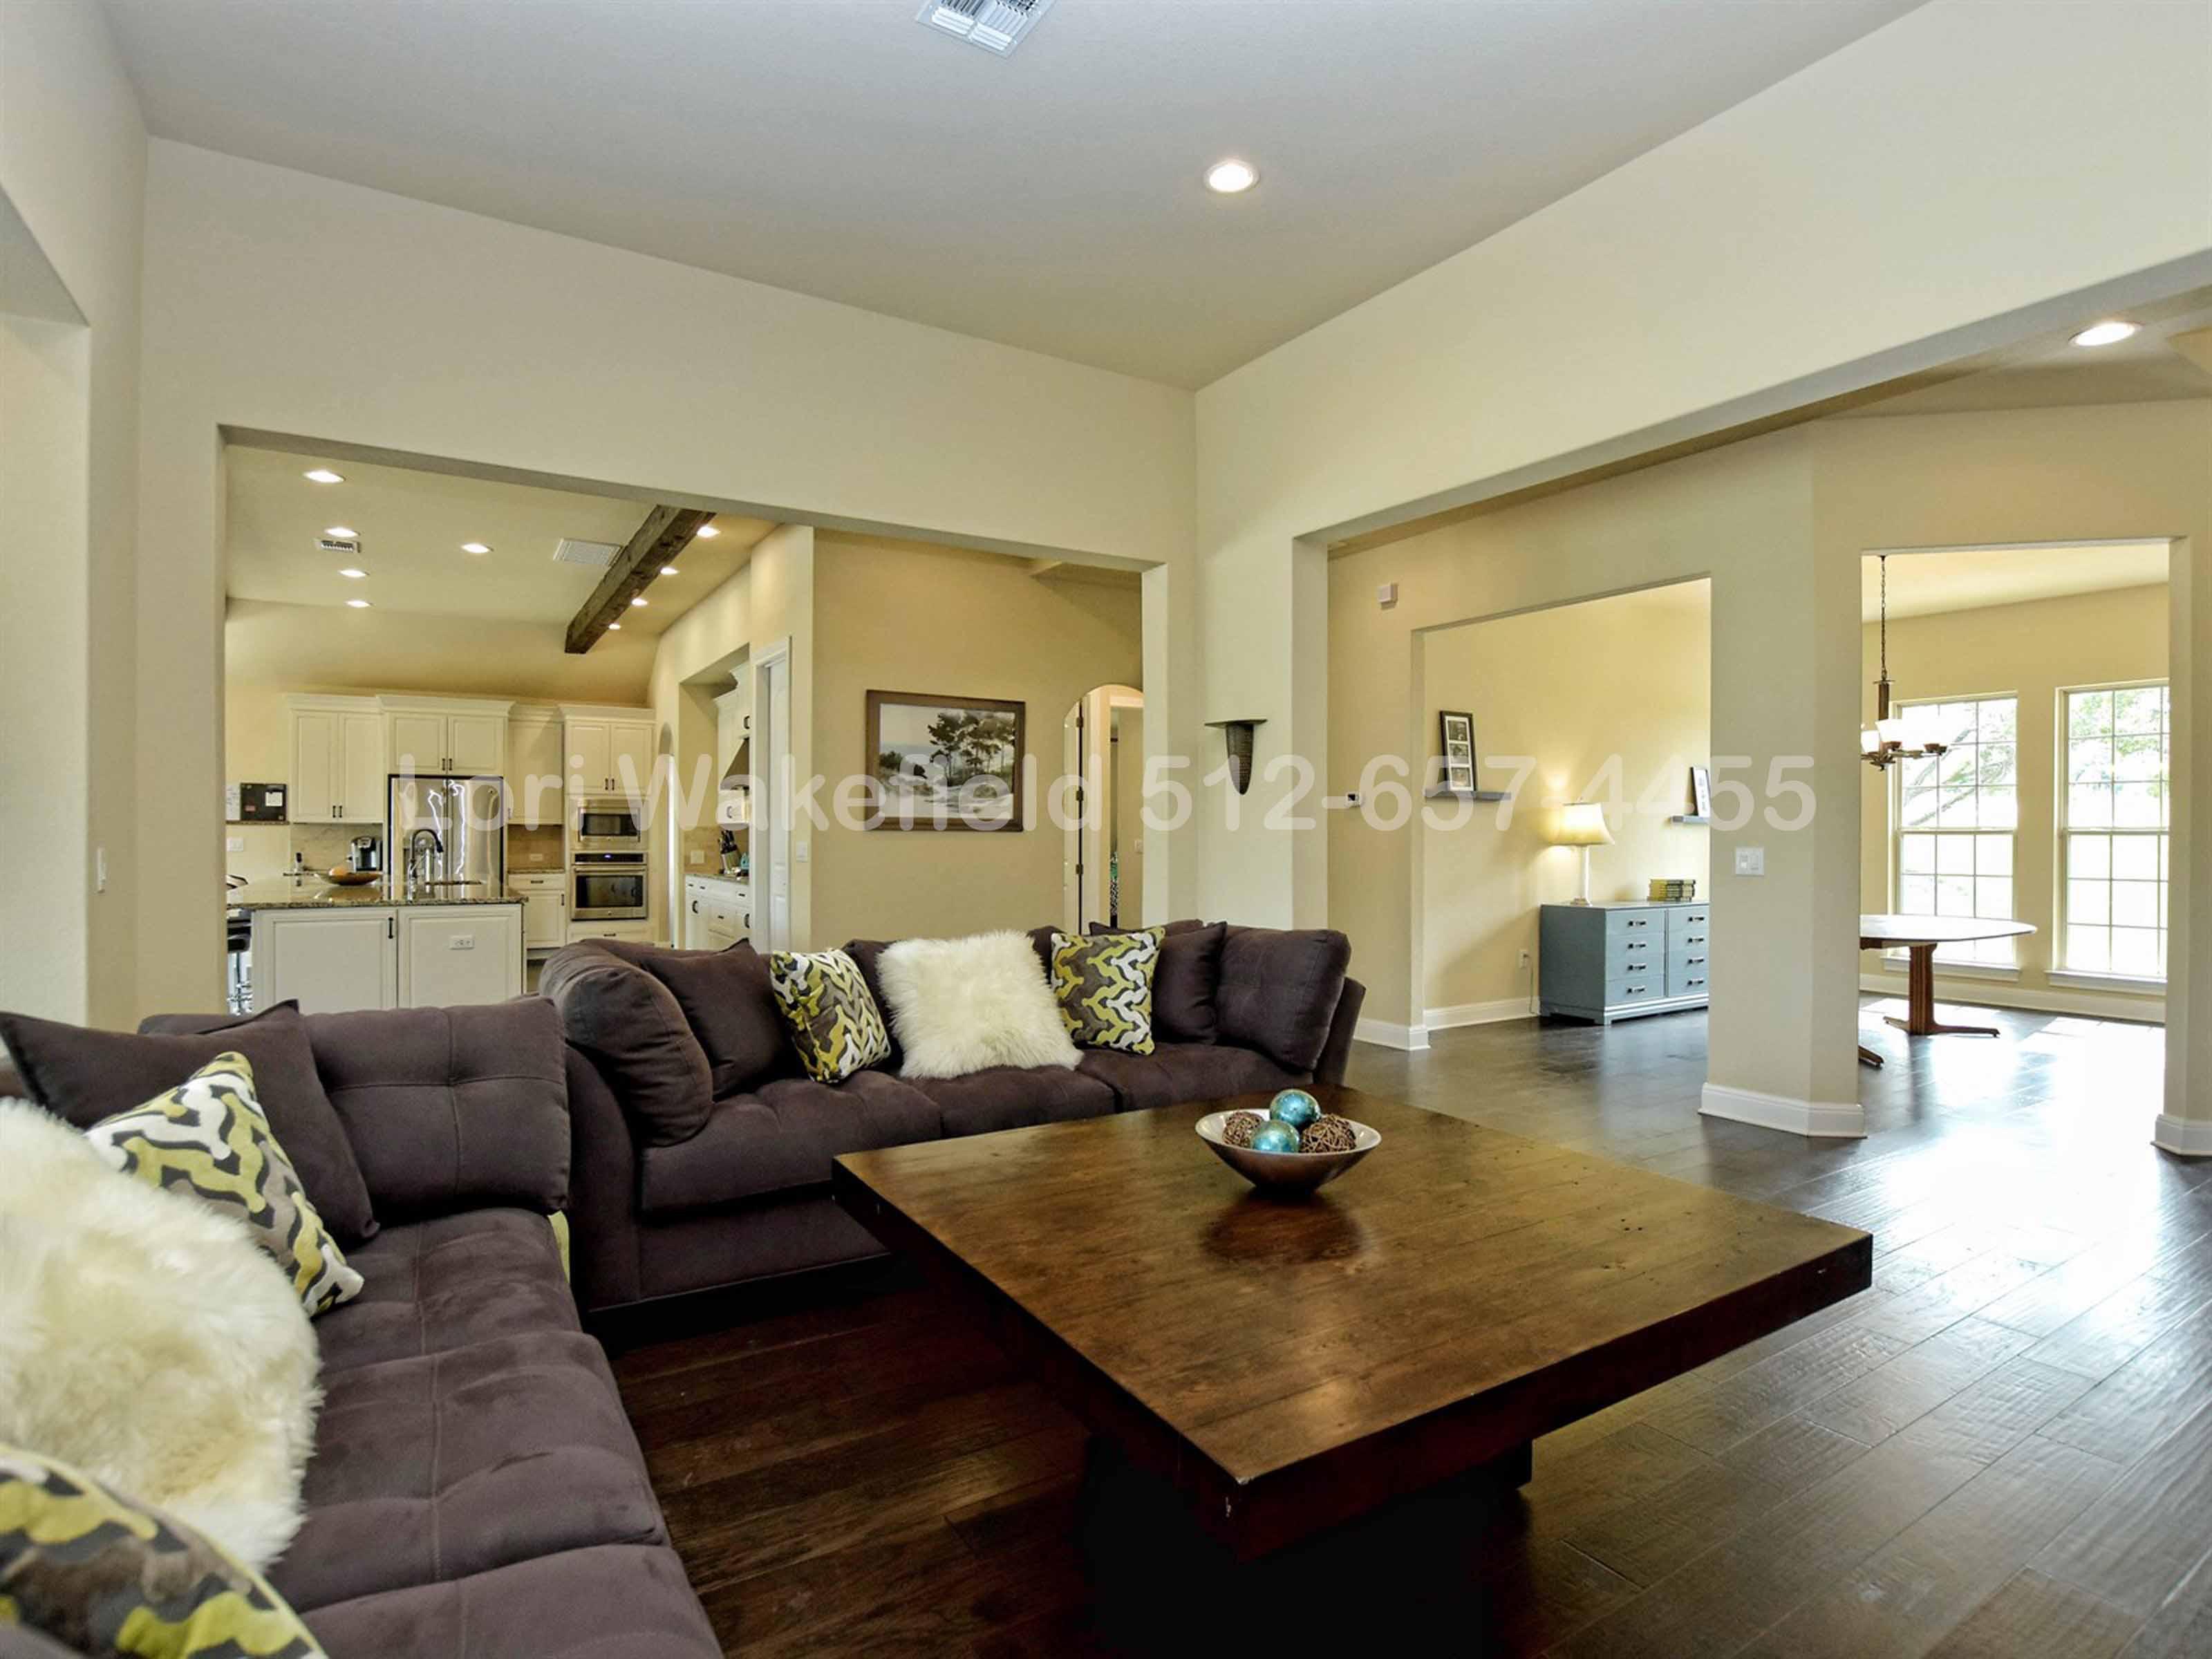 5421 Diamante Dr Spicewood TX | Lake Travis Real Estate | Lori Wakefield REALTOR | Keller Williams Lake Travis